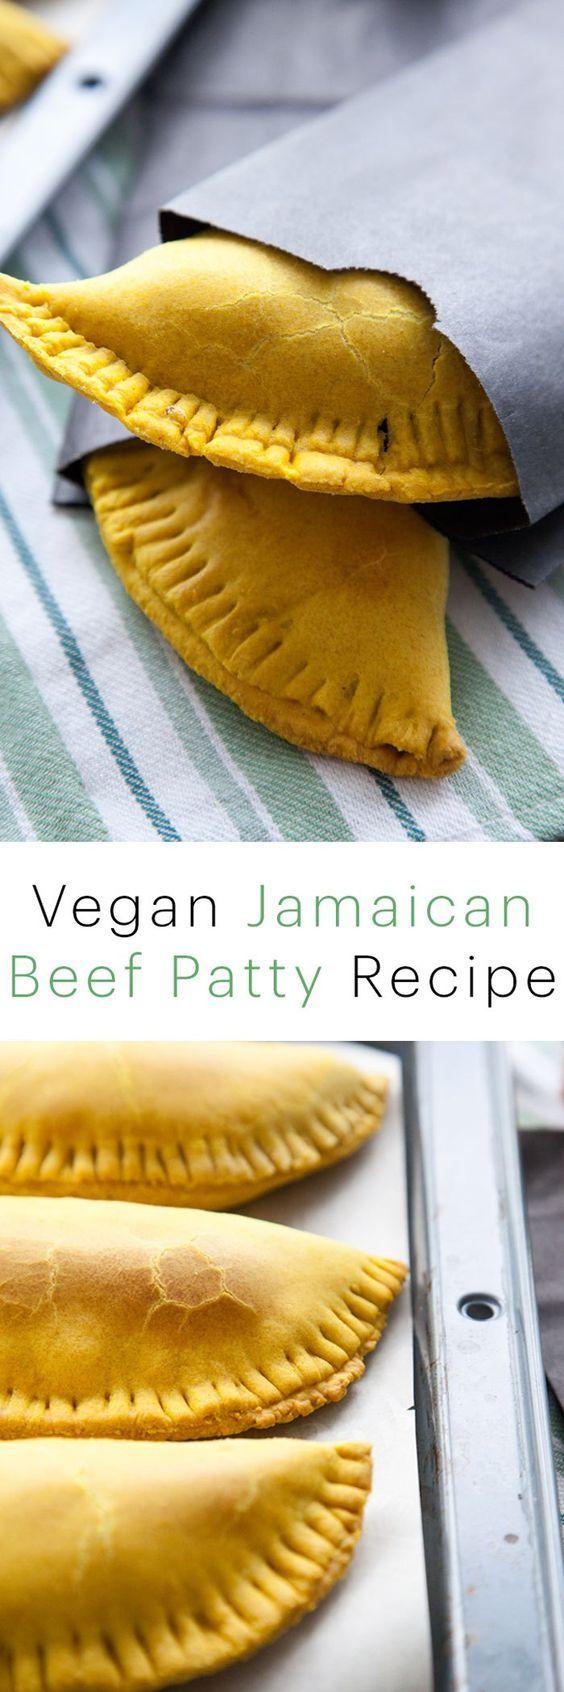 jamaican patties recipe  vegan  recipe  vegan recipes